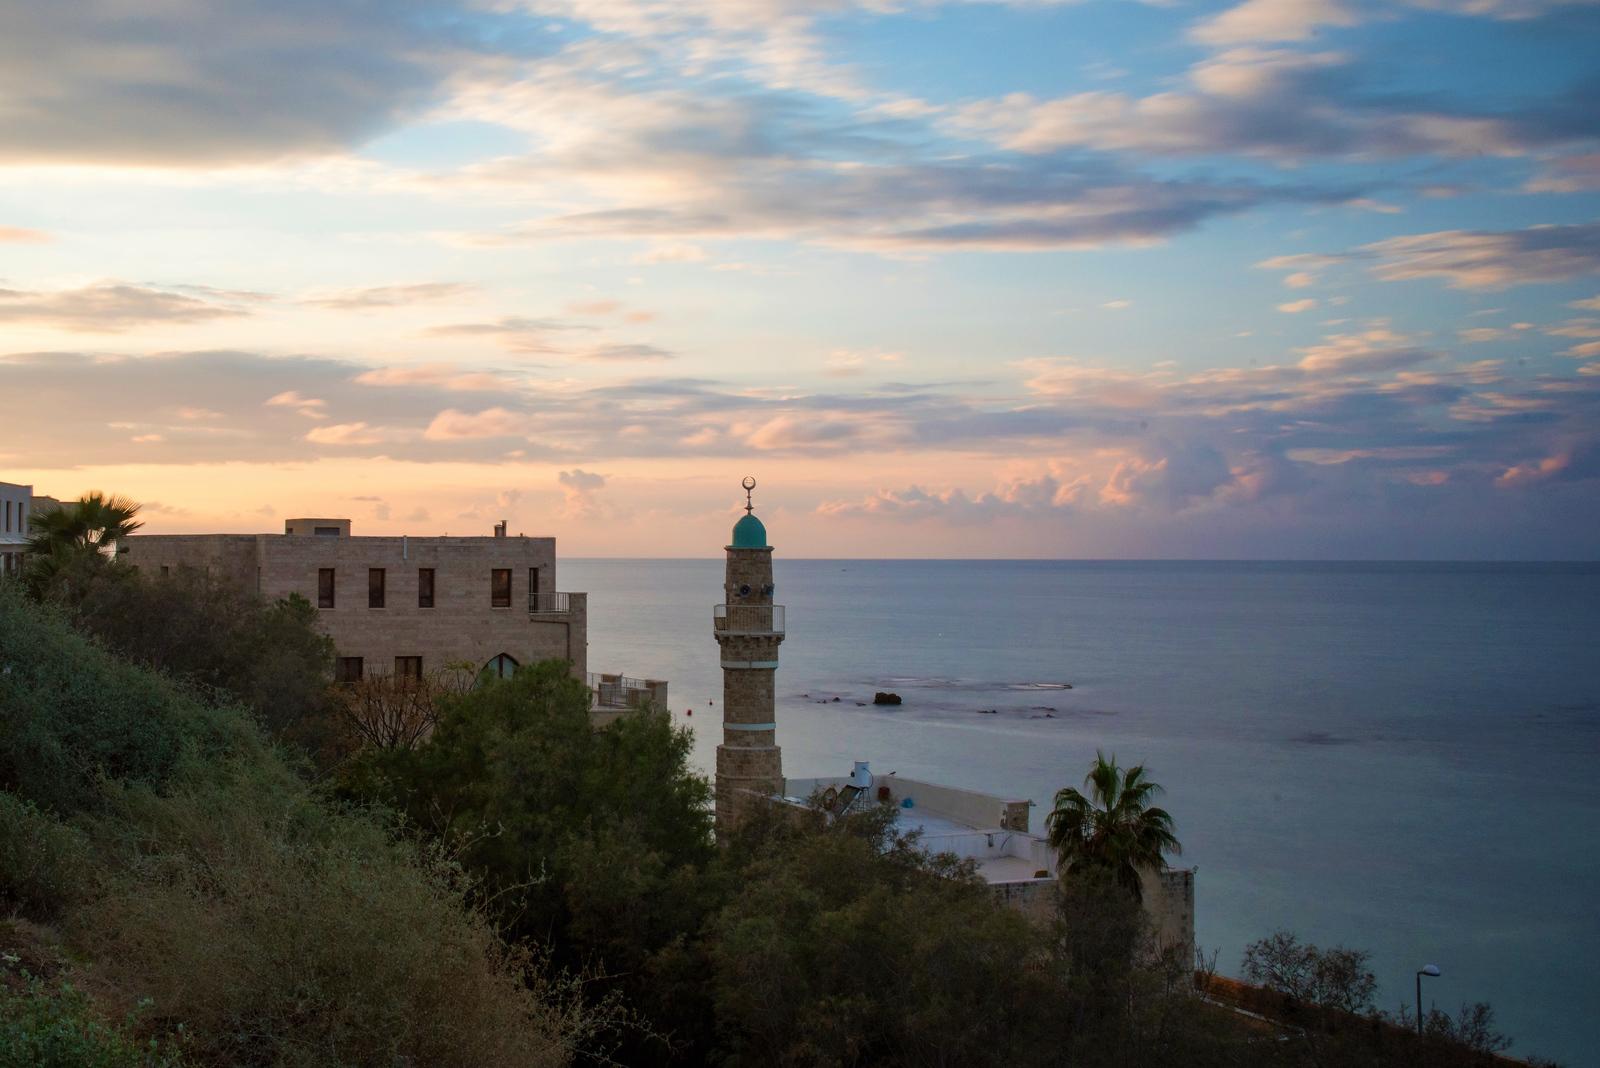 Tel Aviv at Sunset